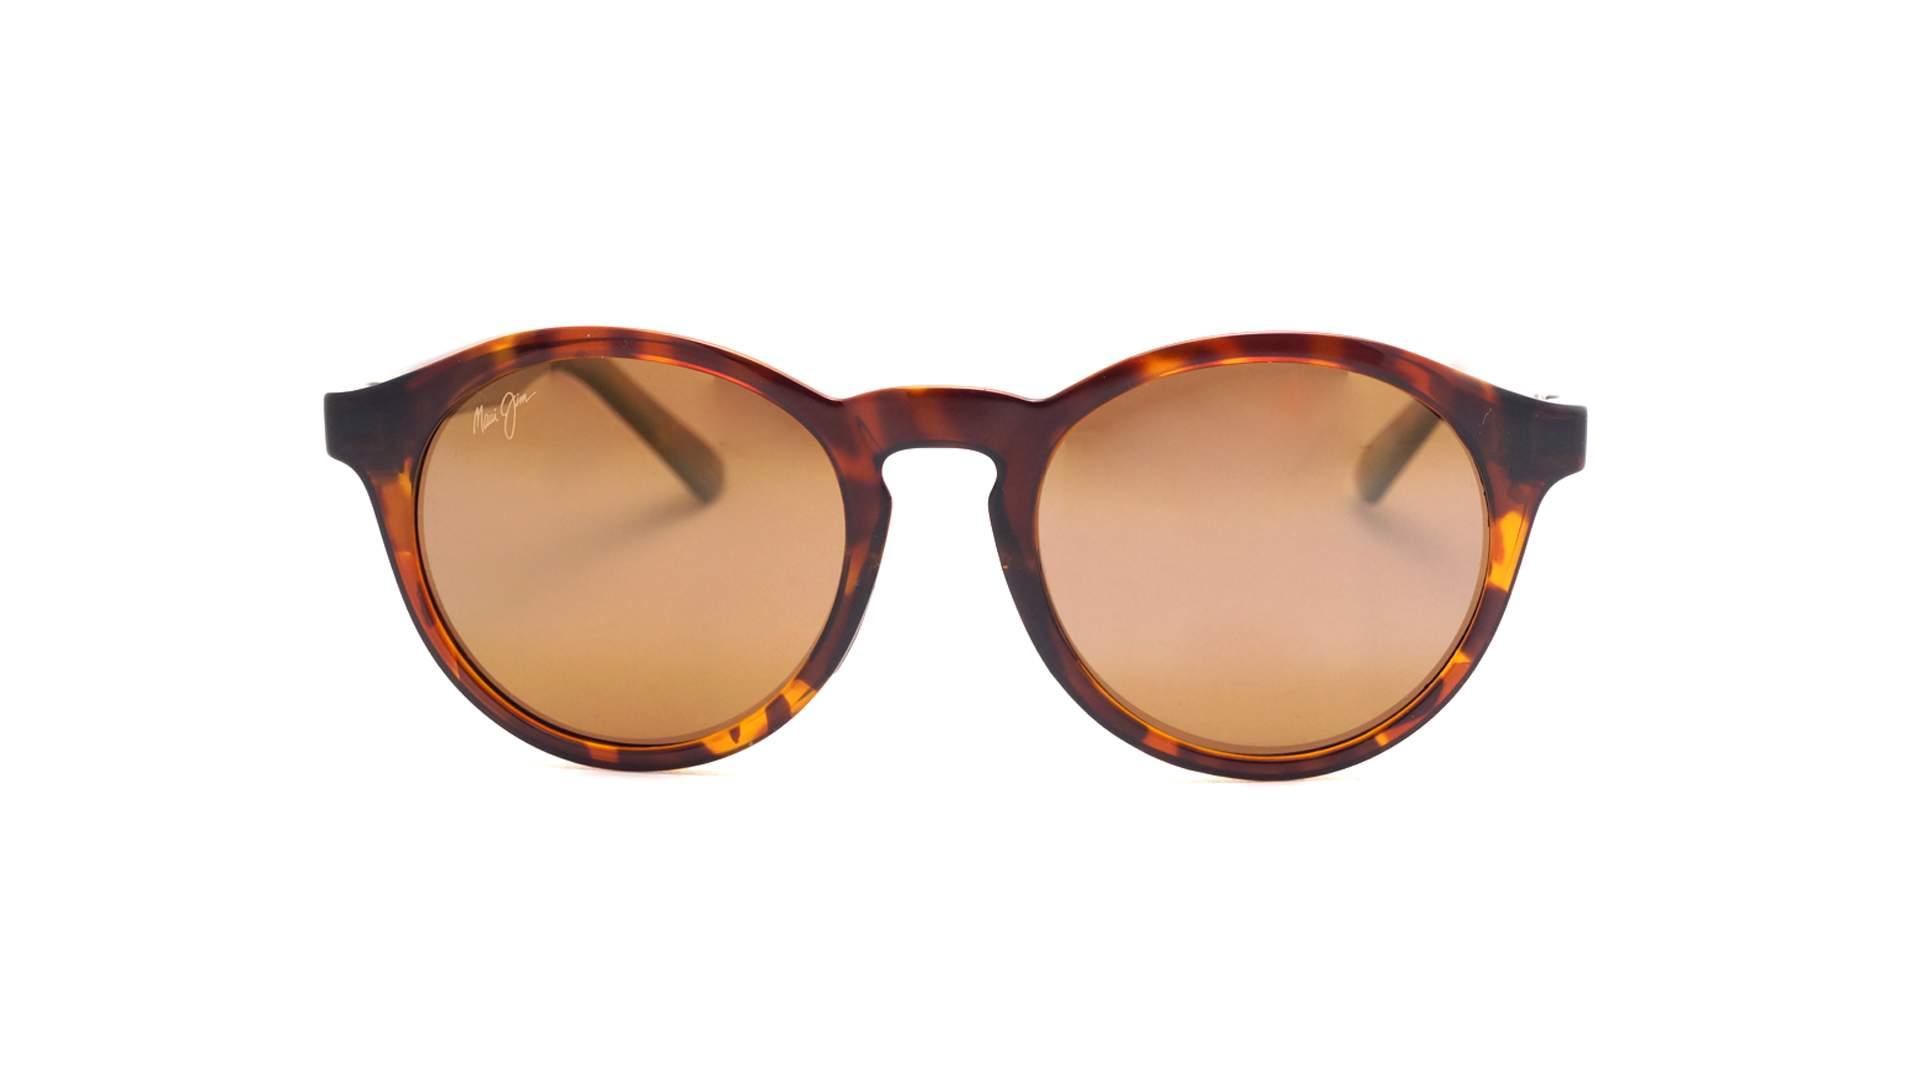 787e6299f2 Sunglasses Maui Jim Pineapple Tortoise Super thin glass H78410 50-20 Medium  Polarized Gradient Mirror